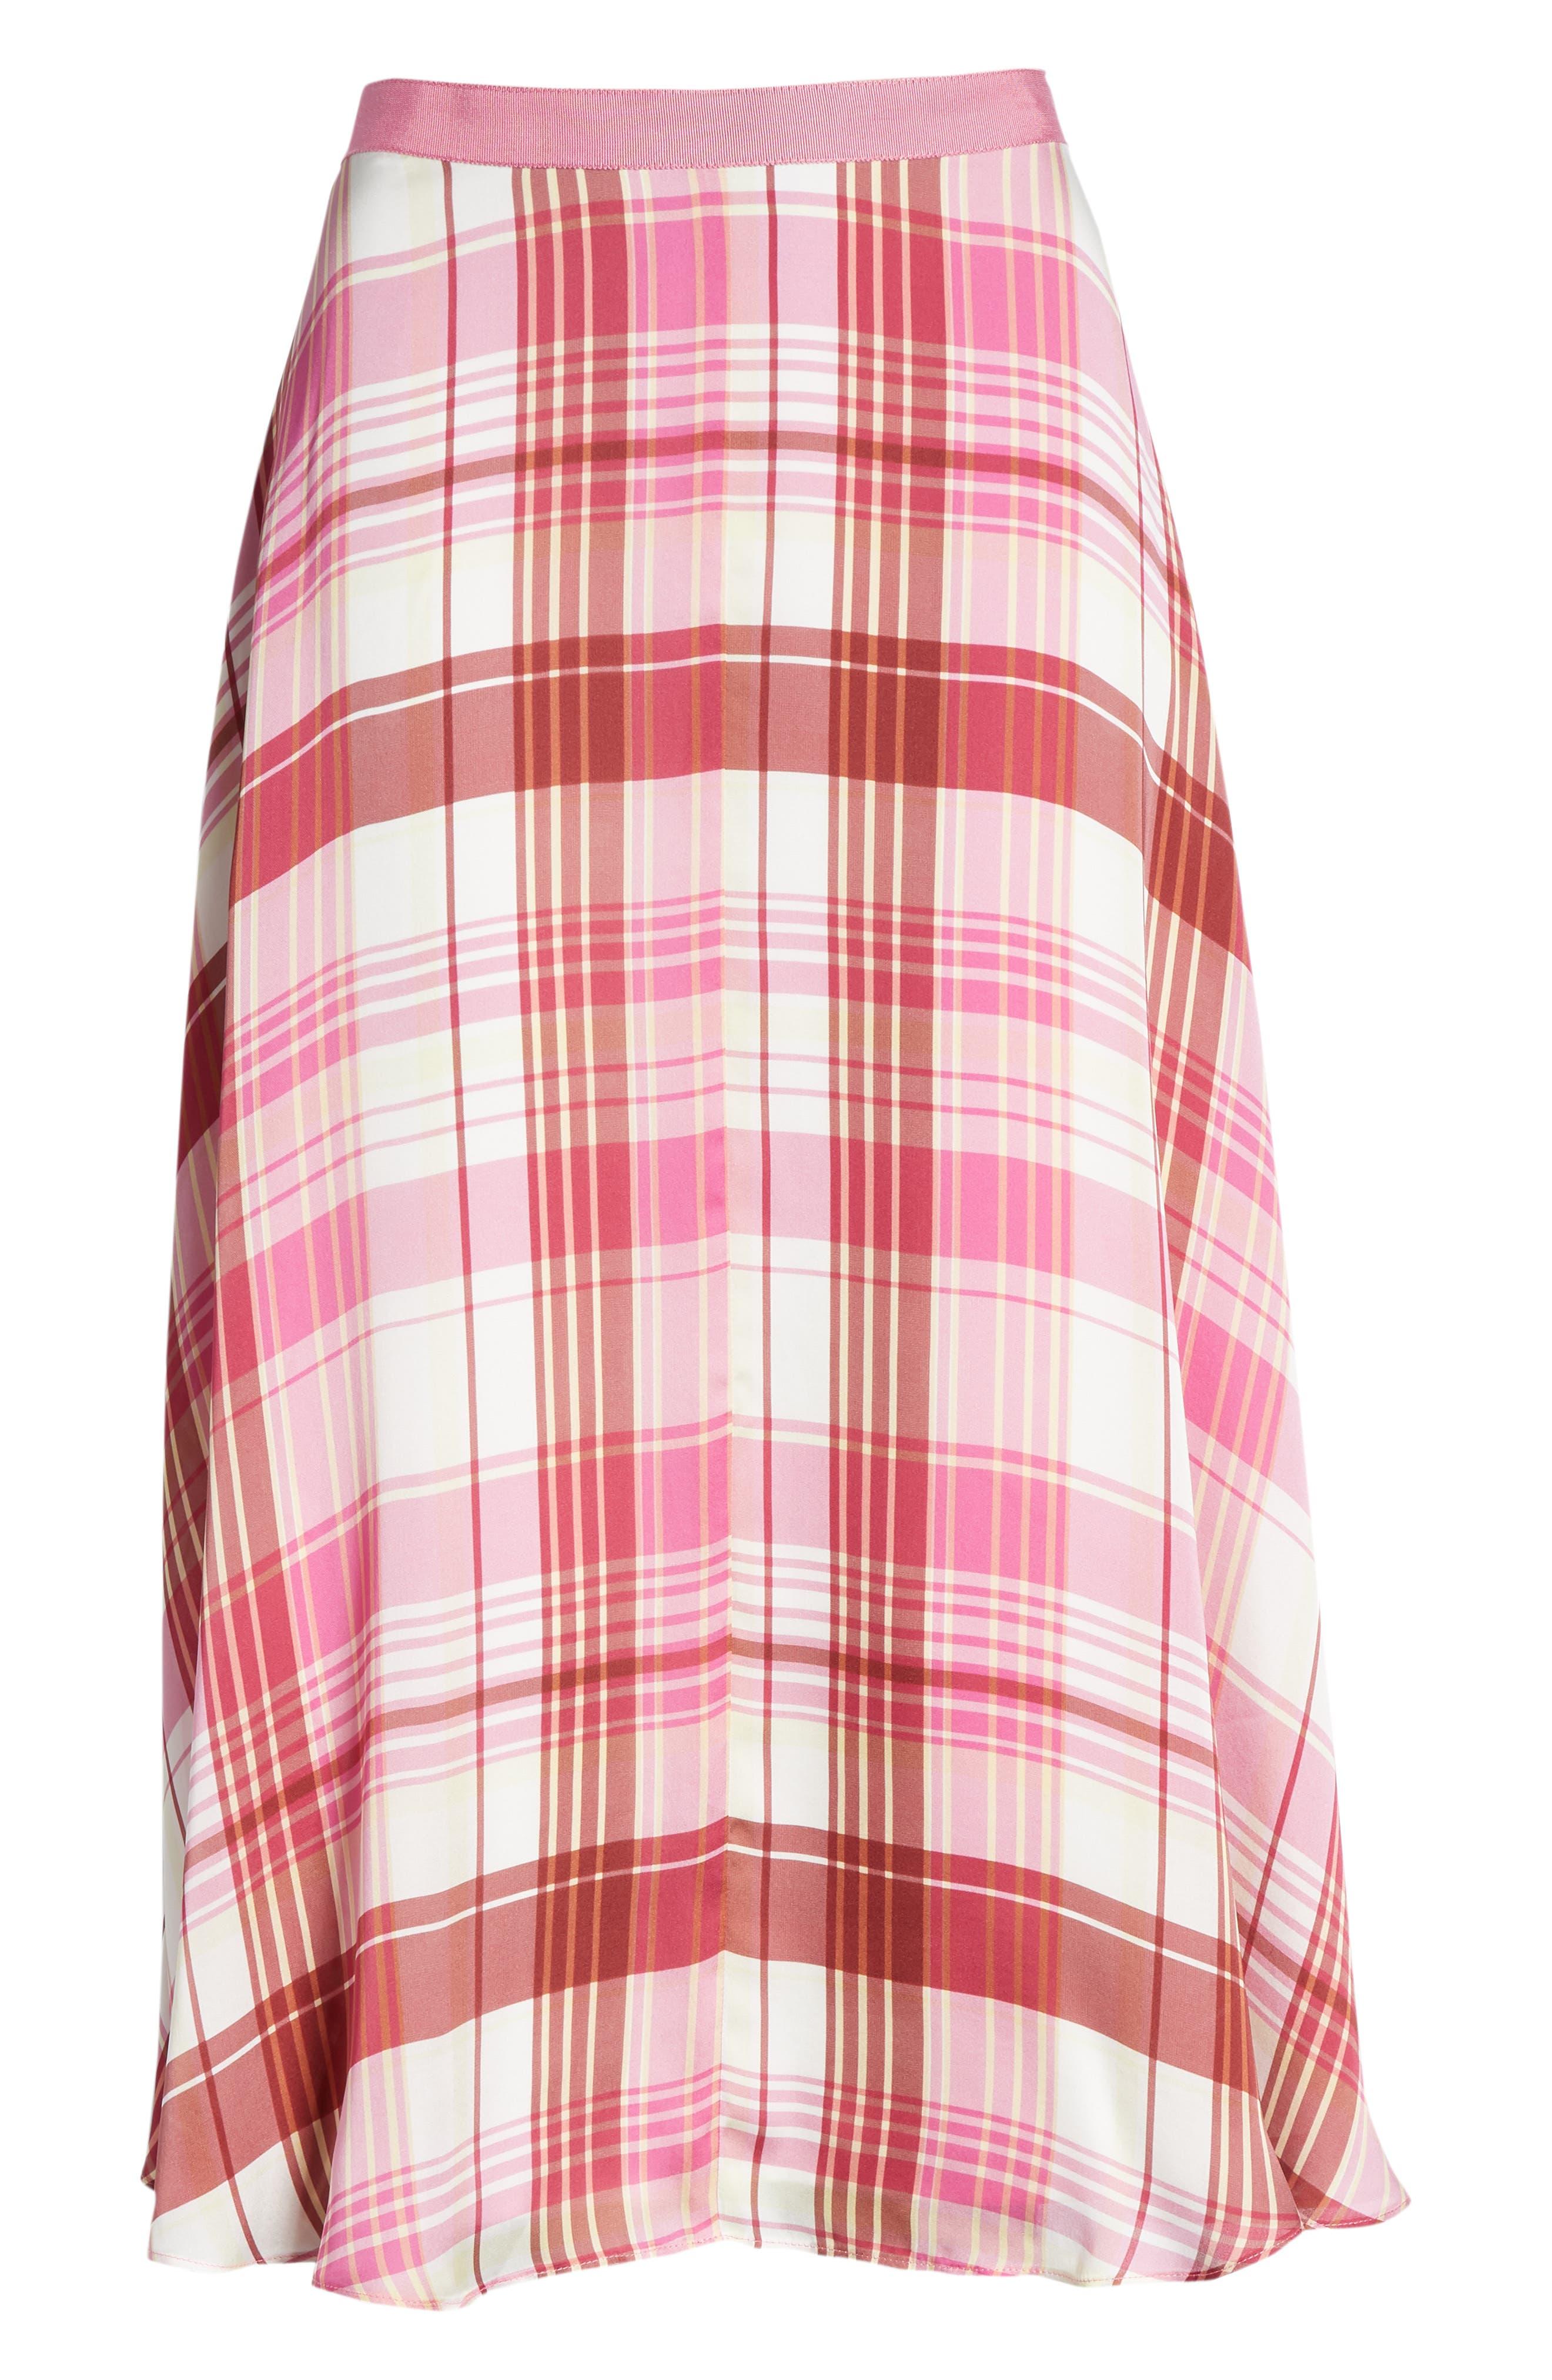 Plaid Silk Skirt,                             Alternate thumbnail 6, color,                             PINK PHLOX LARA PLAID